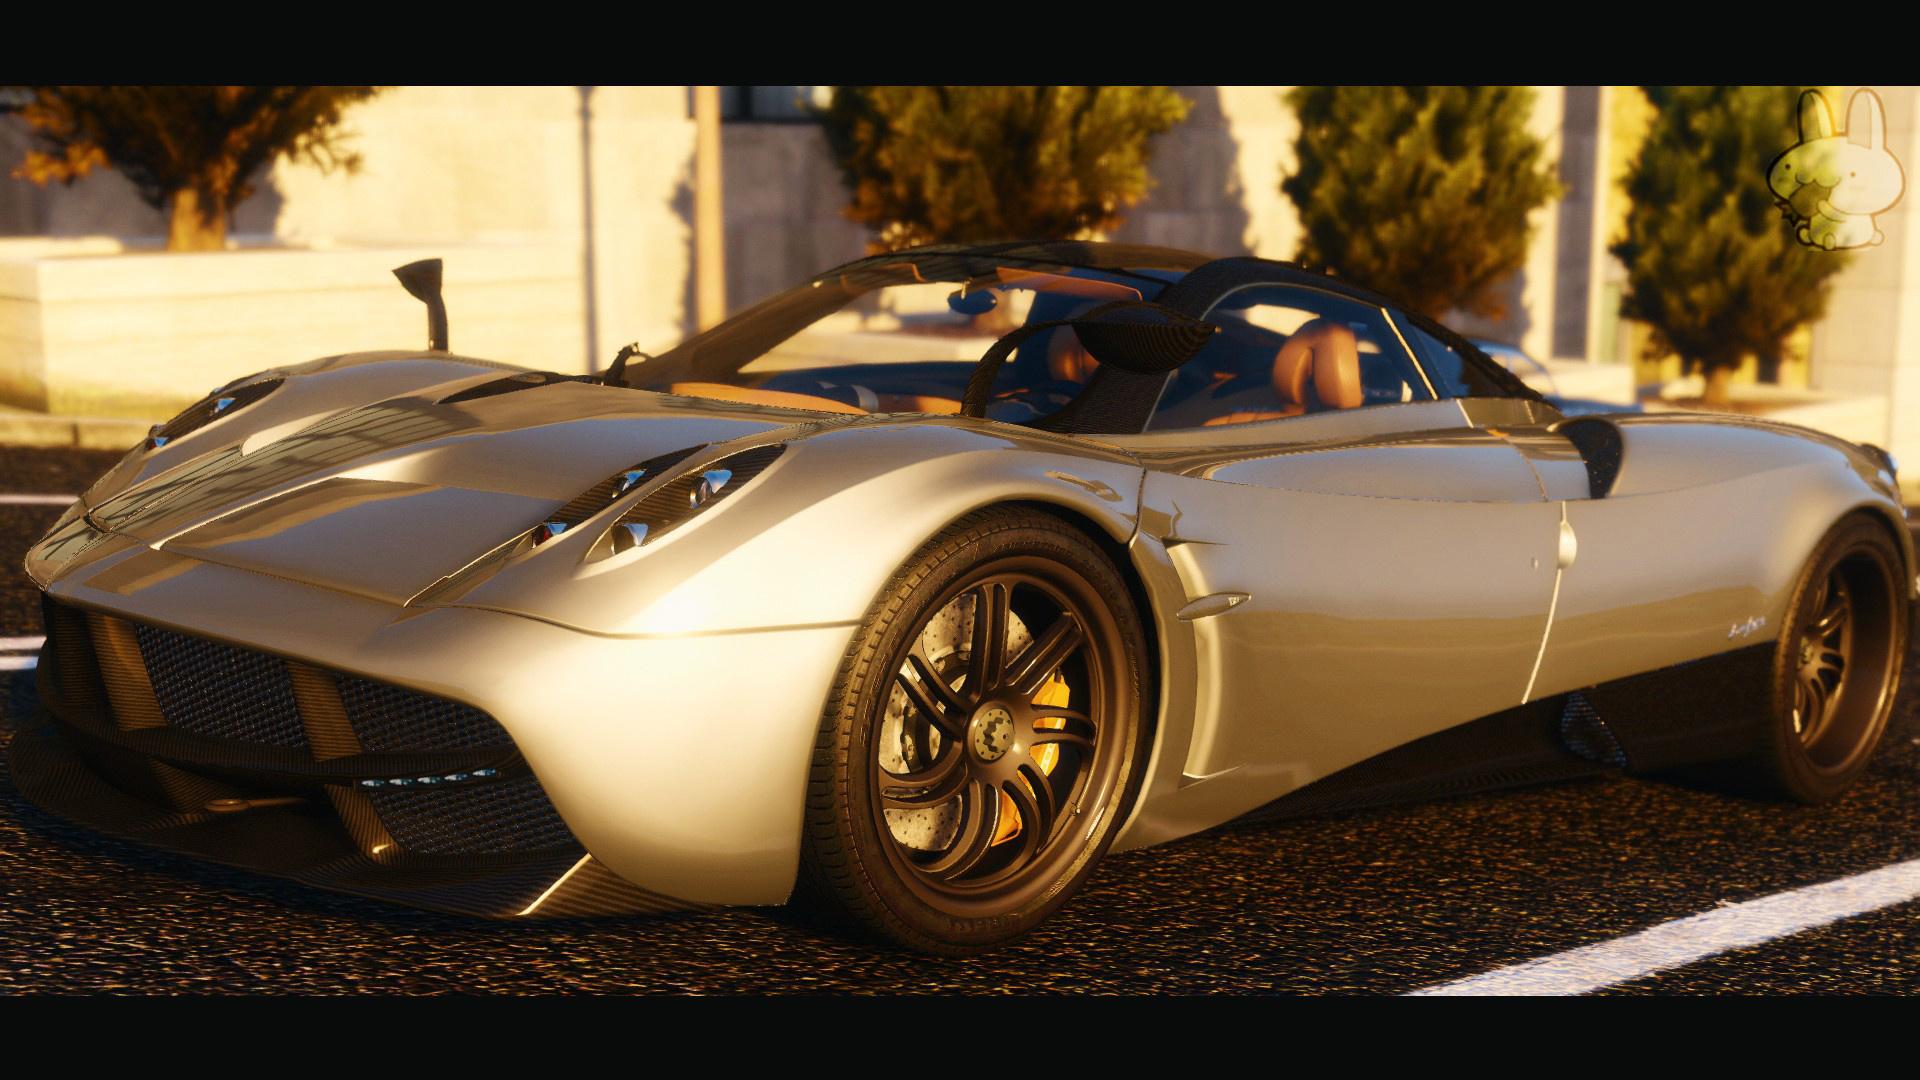 2014 Pagani Huayra Replace Animated Engine Tuning Gta5 Mods Com